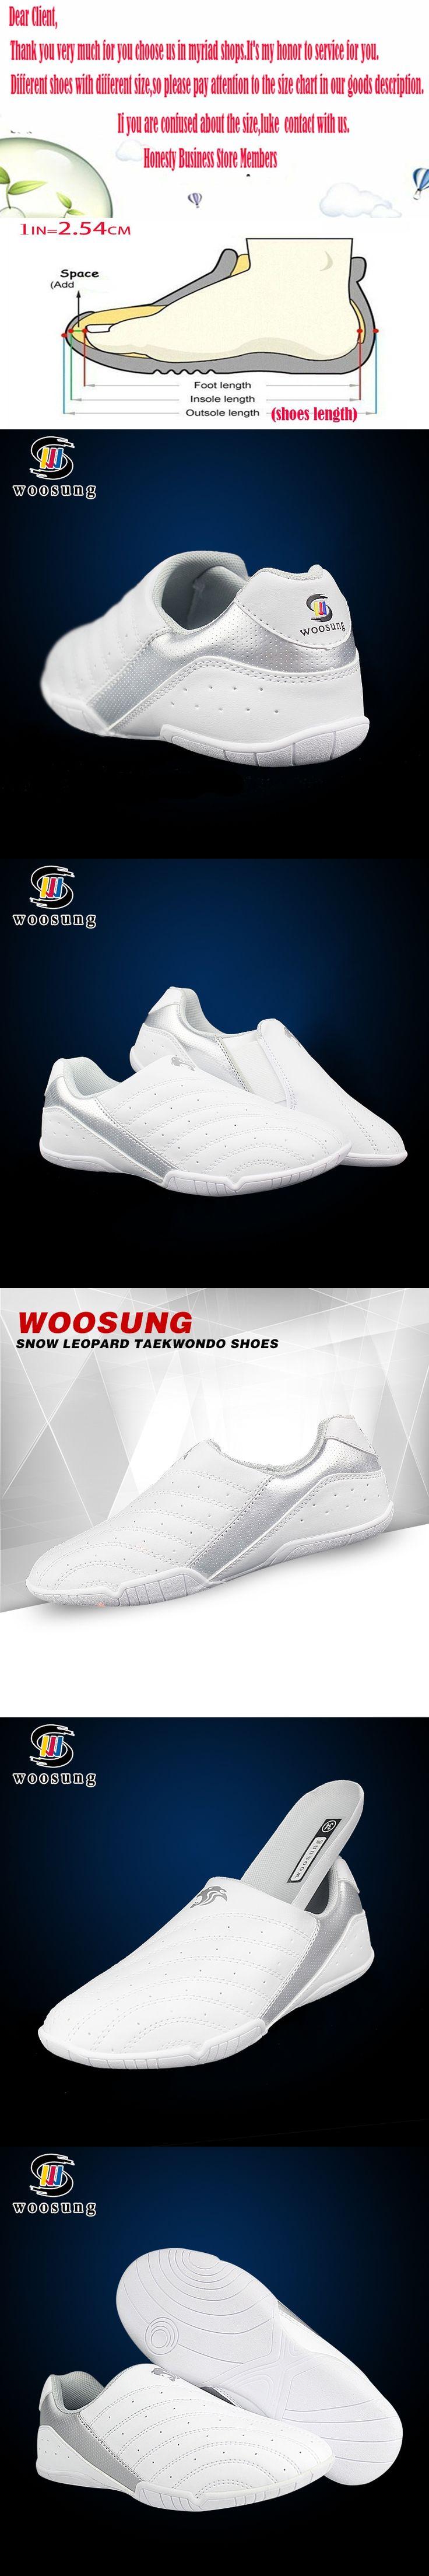 Wholesale Fitness health kids Adult WTF PU leather Breathable shoeswear foot protector guard Taekwondo shoes kick boxing Shoes